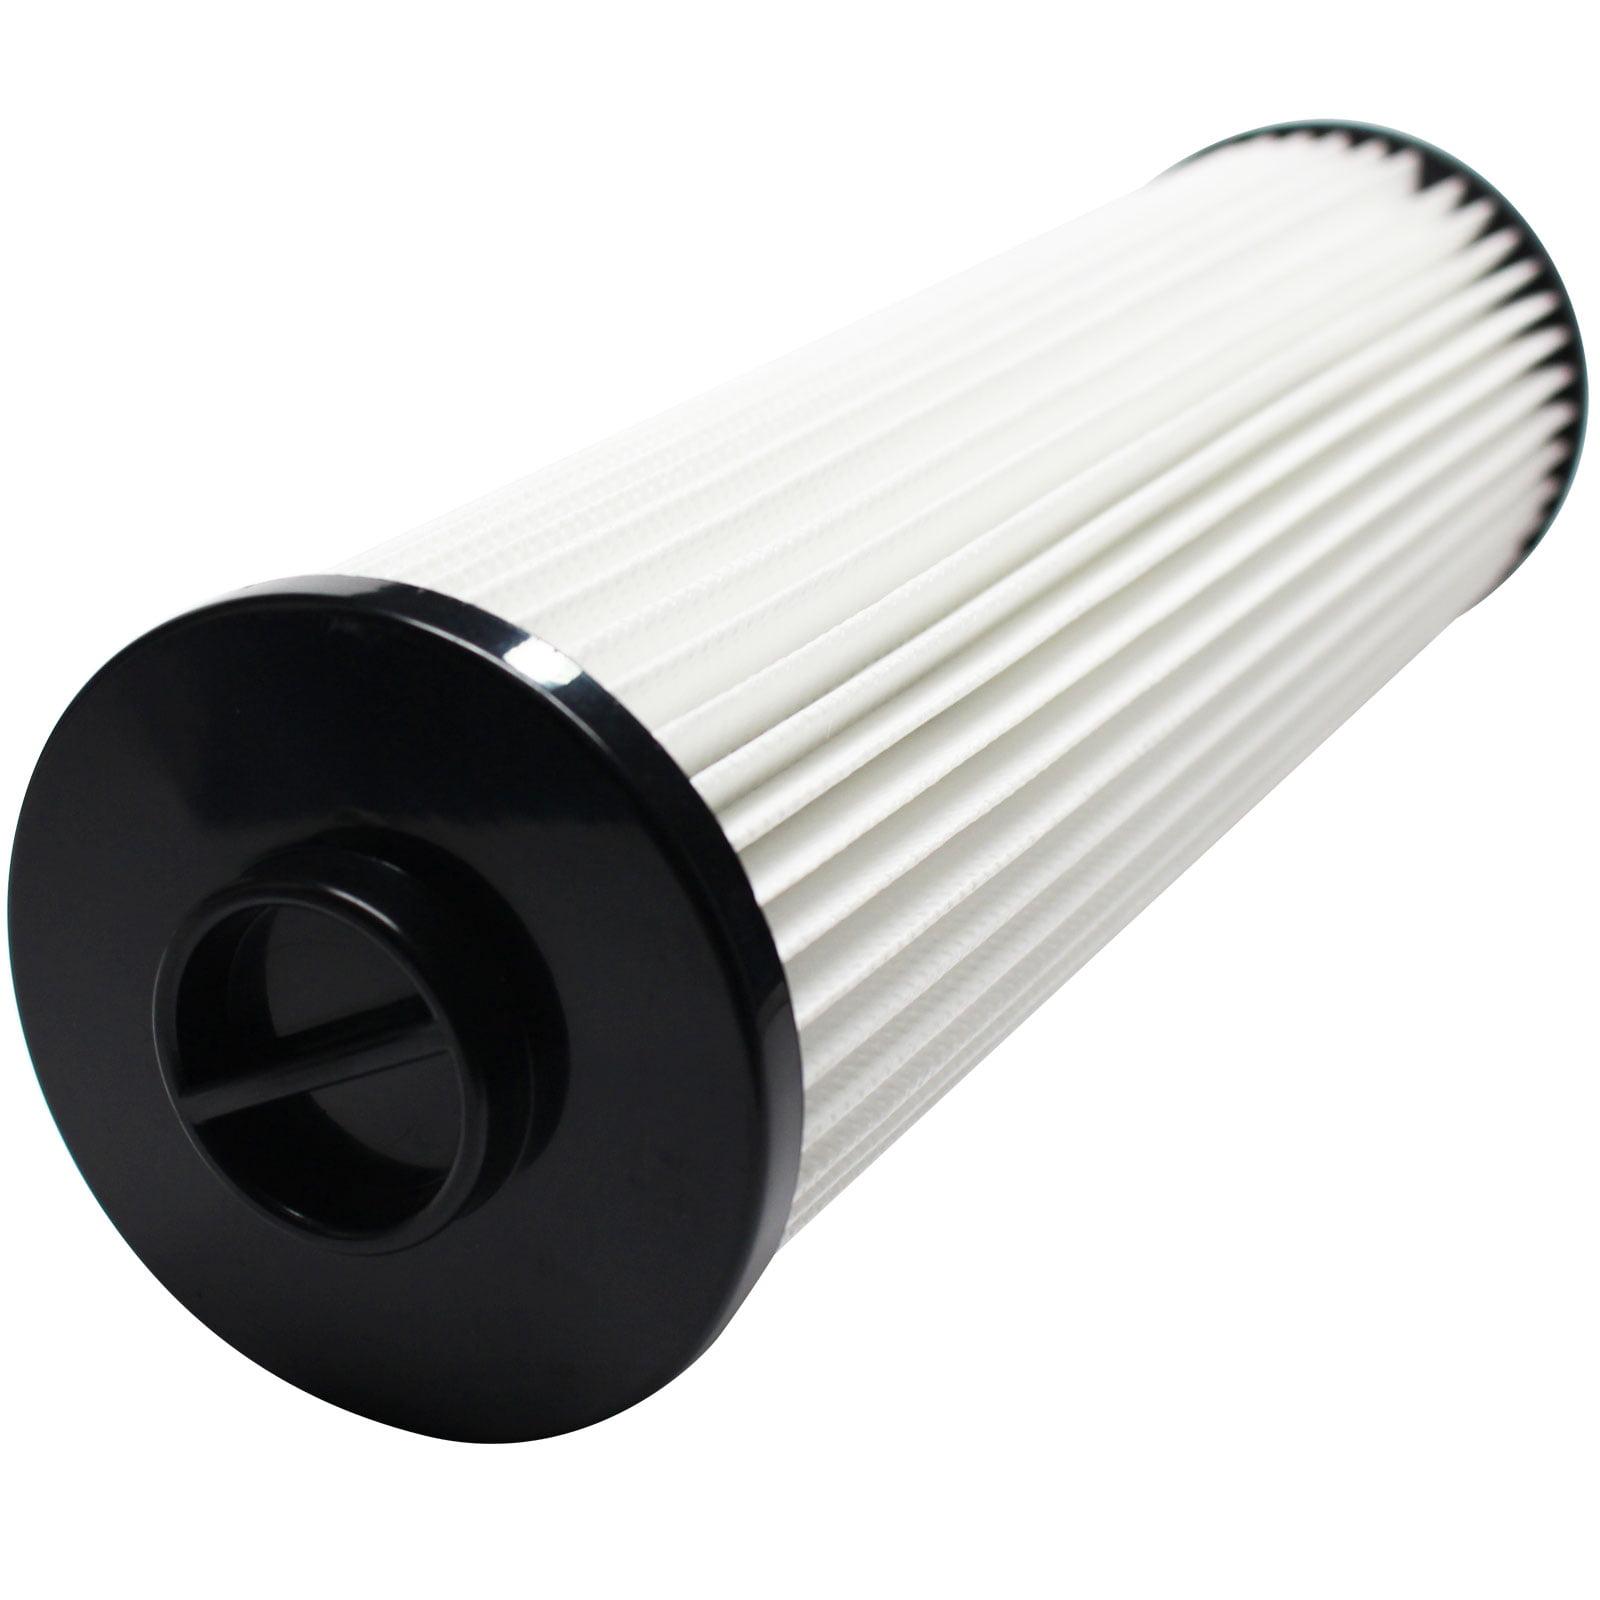 Hoover Turbo 4600 EmPower Upright U5268900 Vacuum HEPA Cartridge Filter for